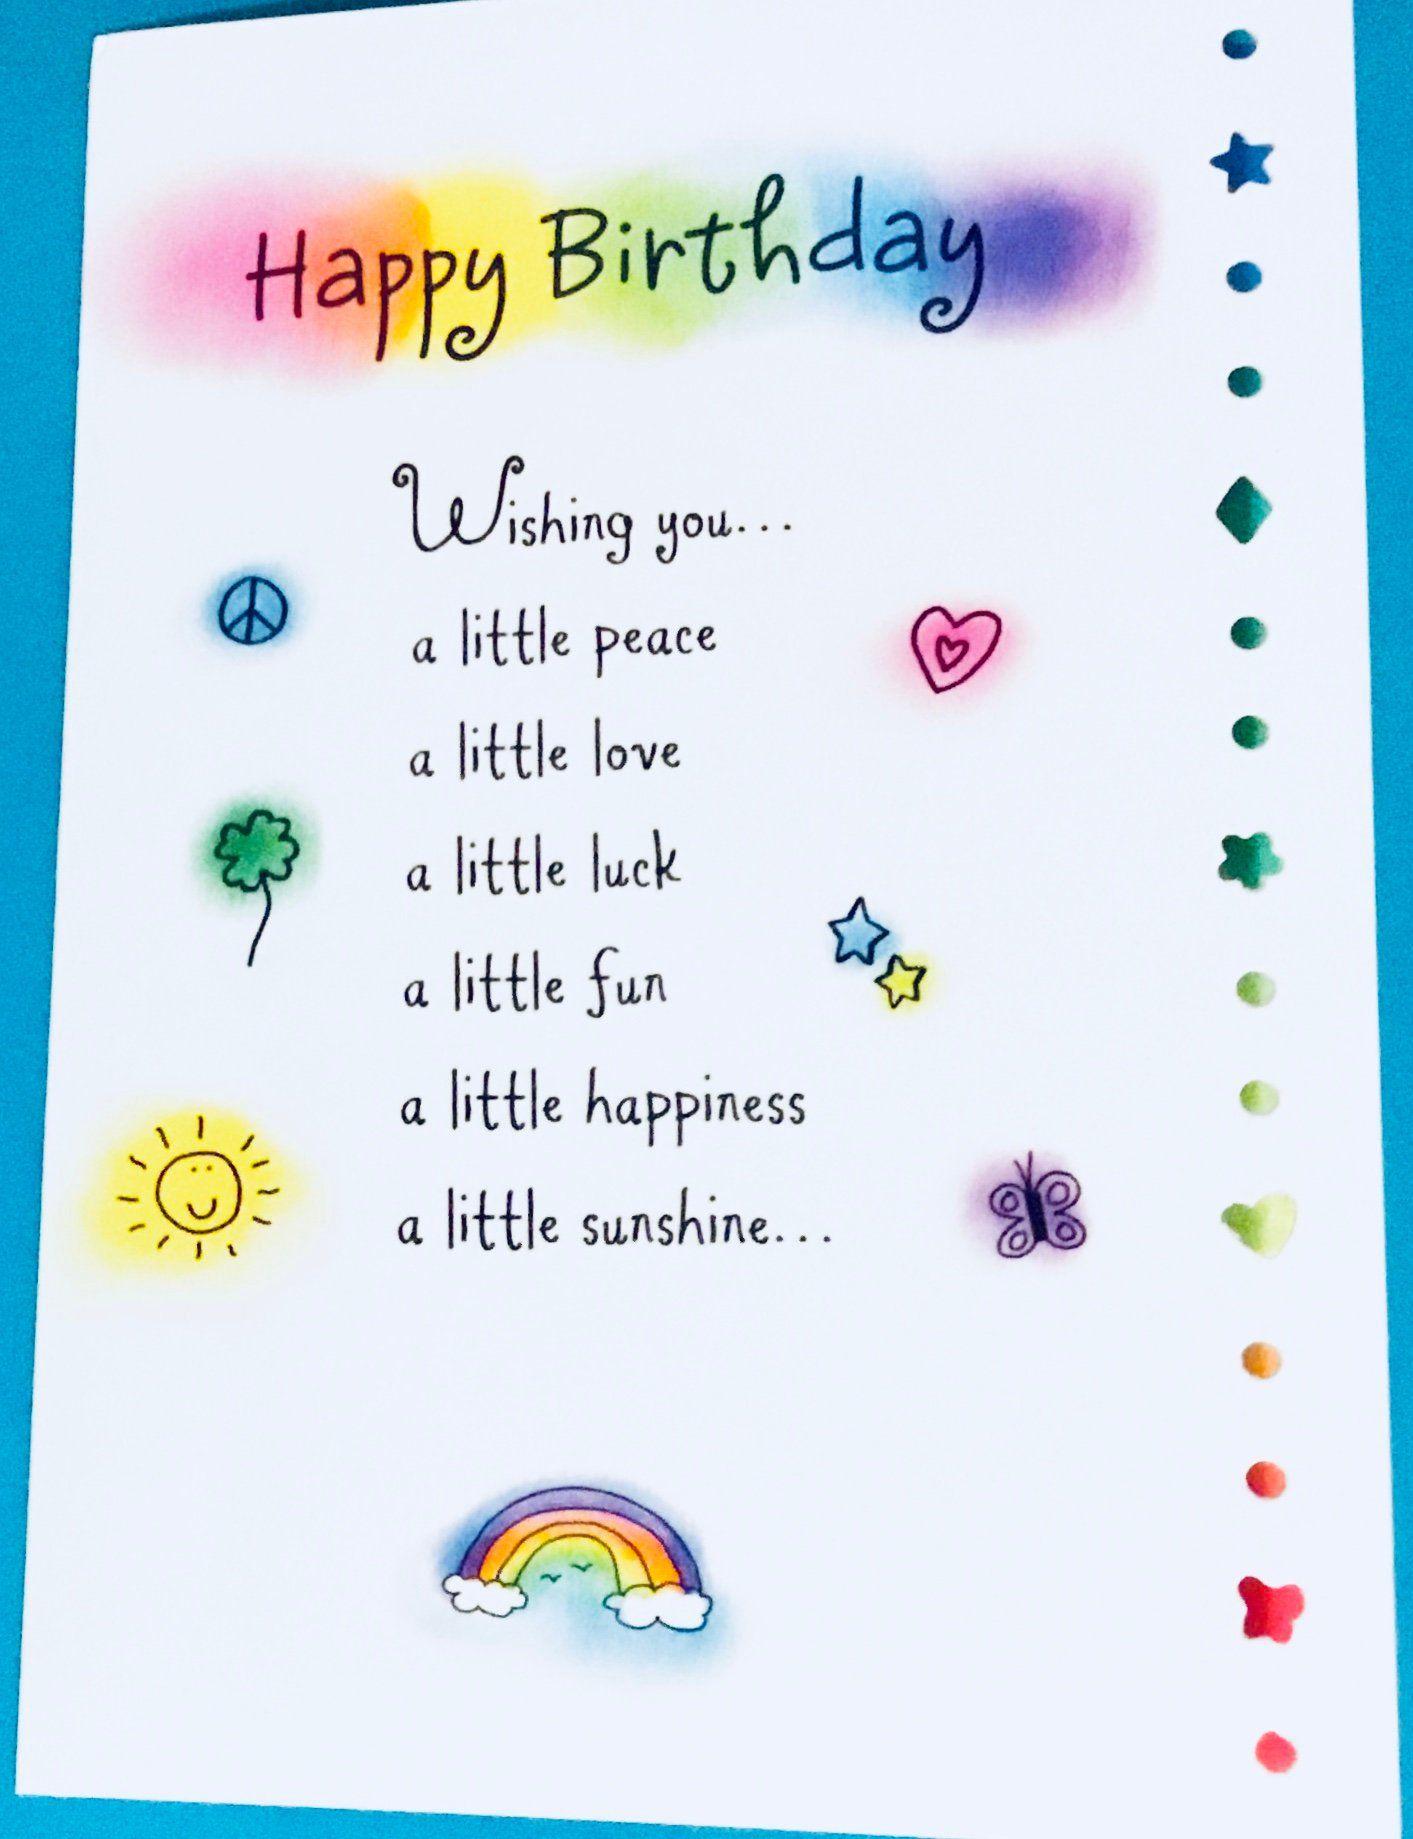 A Very Special Happy Birthday Greeting Card, bday card, birthday